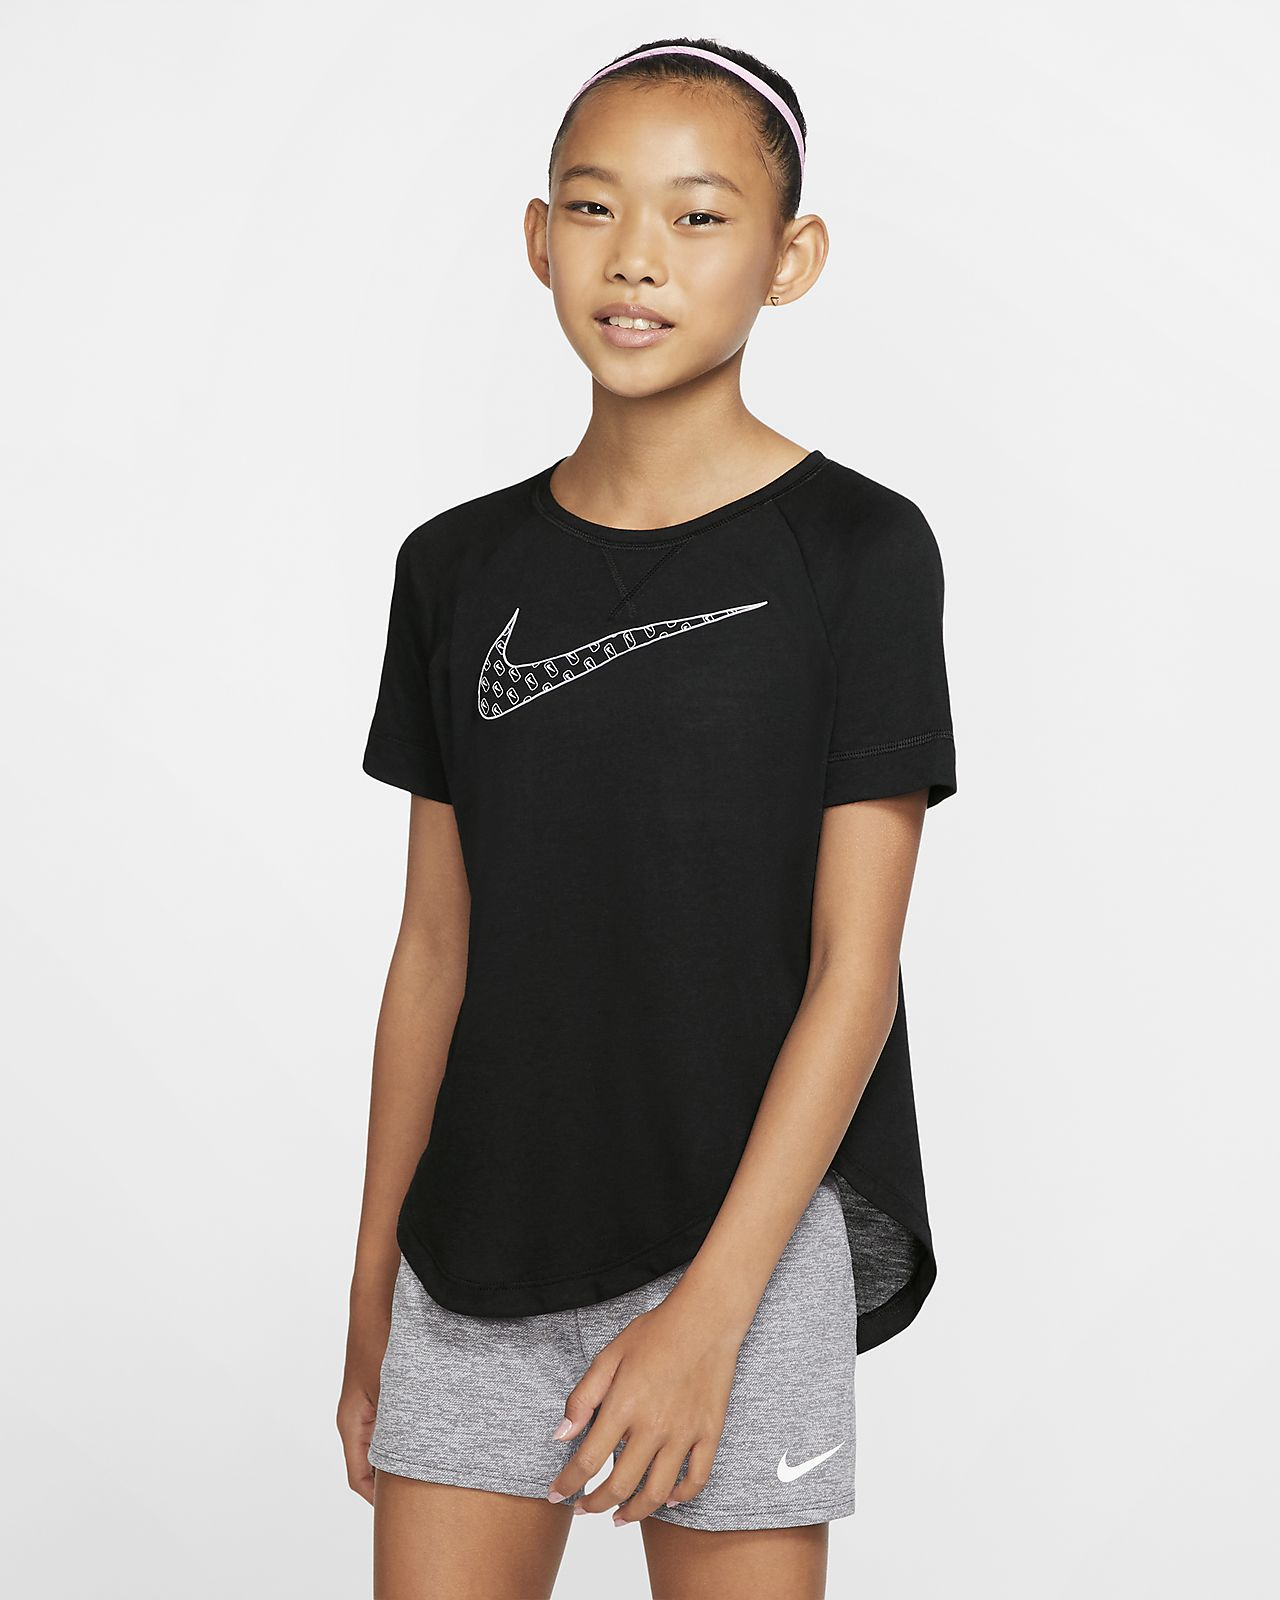 Nike Dri-FIT Trophy Big Kids' (Girls') Short-Sleeve Graphic Training Top